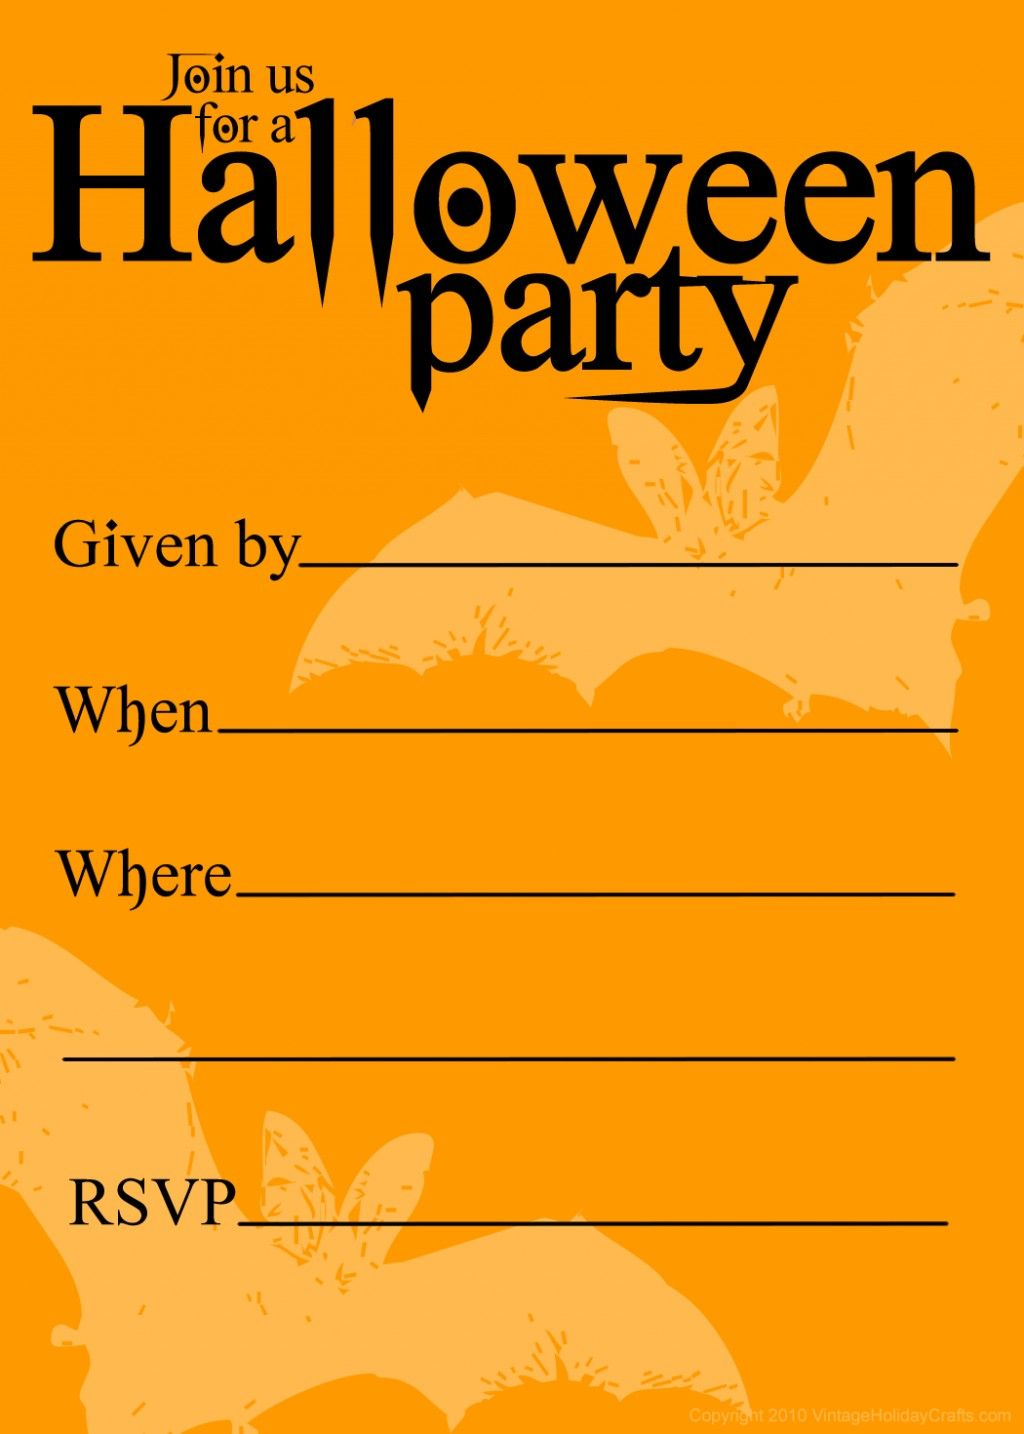 Free Printable Halloween Birthday Invitations Templates | Halloween - Free Printable Halloween Birthday Party Invitations